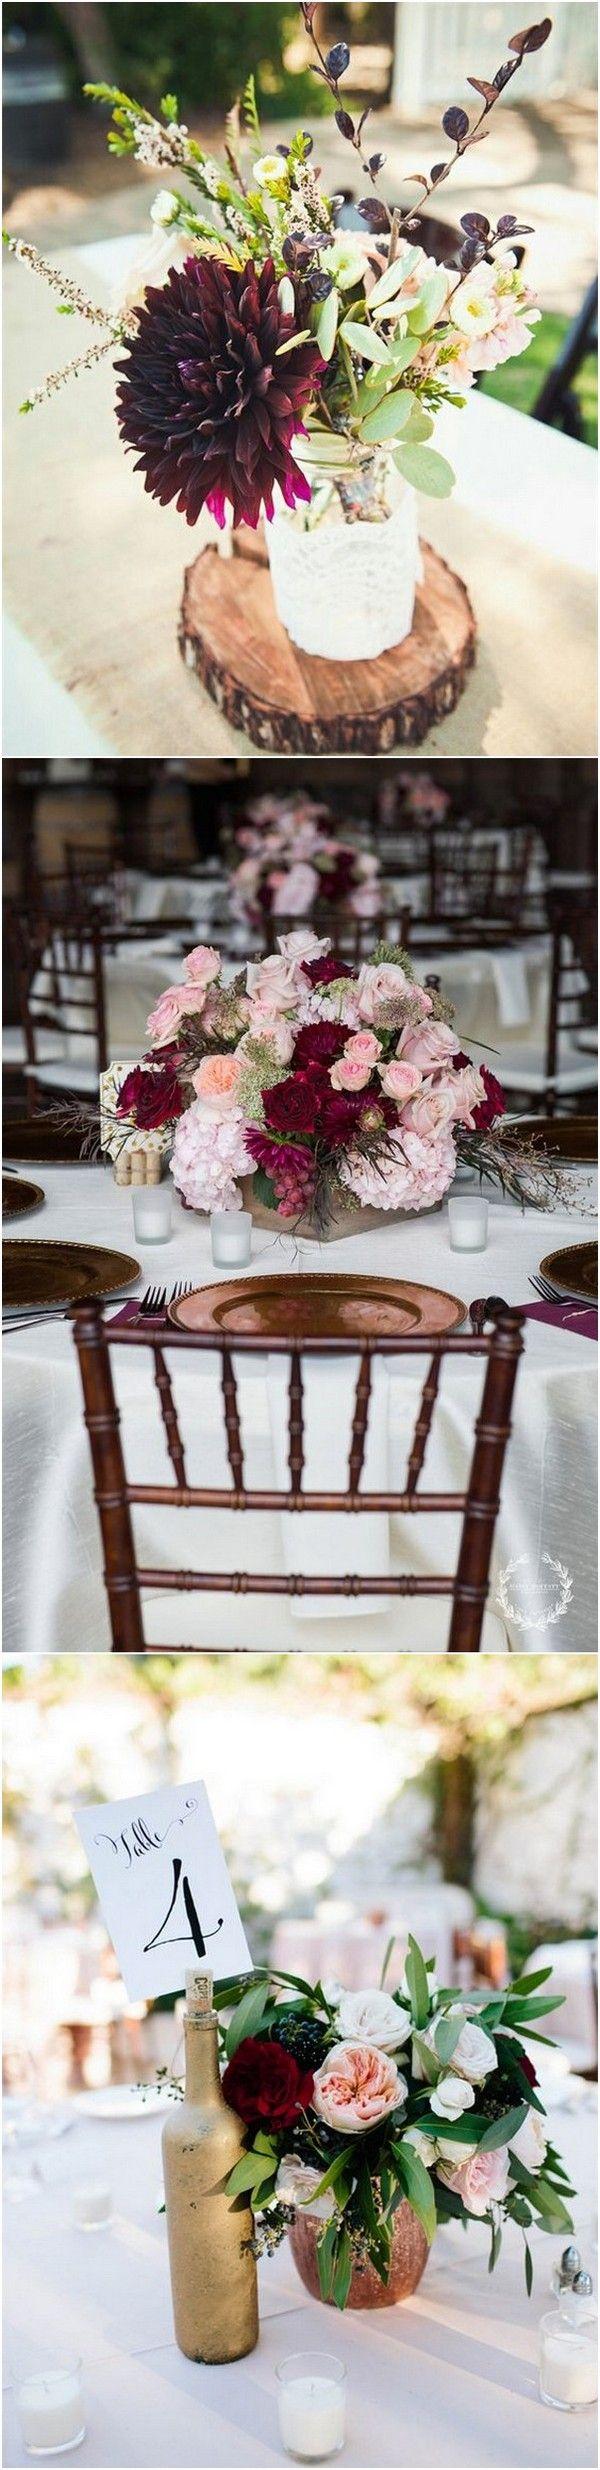 Outdoor fall wedding decor  Top  Burgundy Wedding Centerpieces for Fall   Pinterest